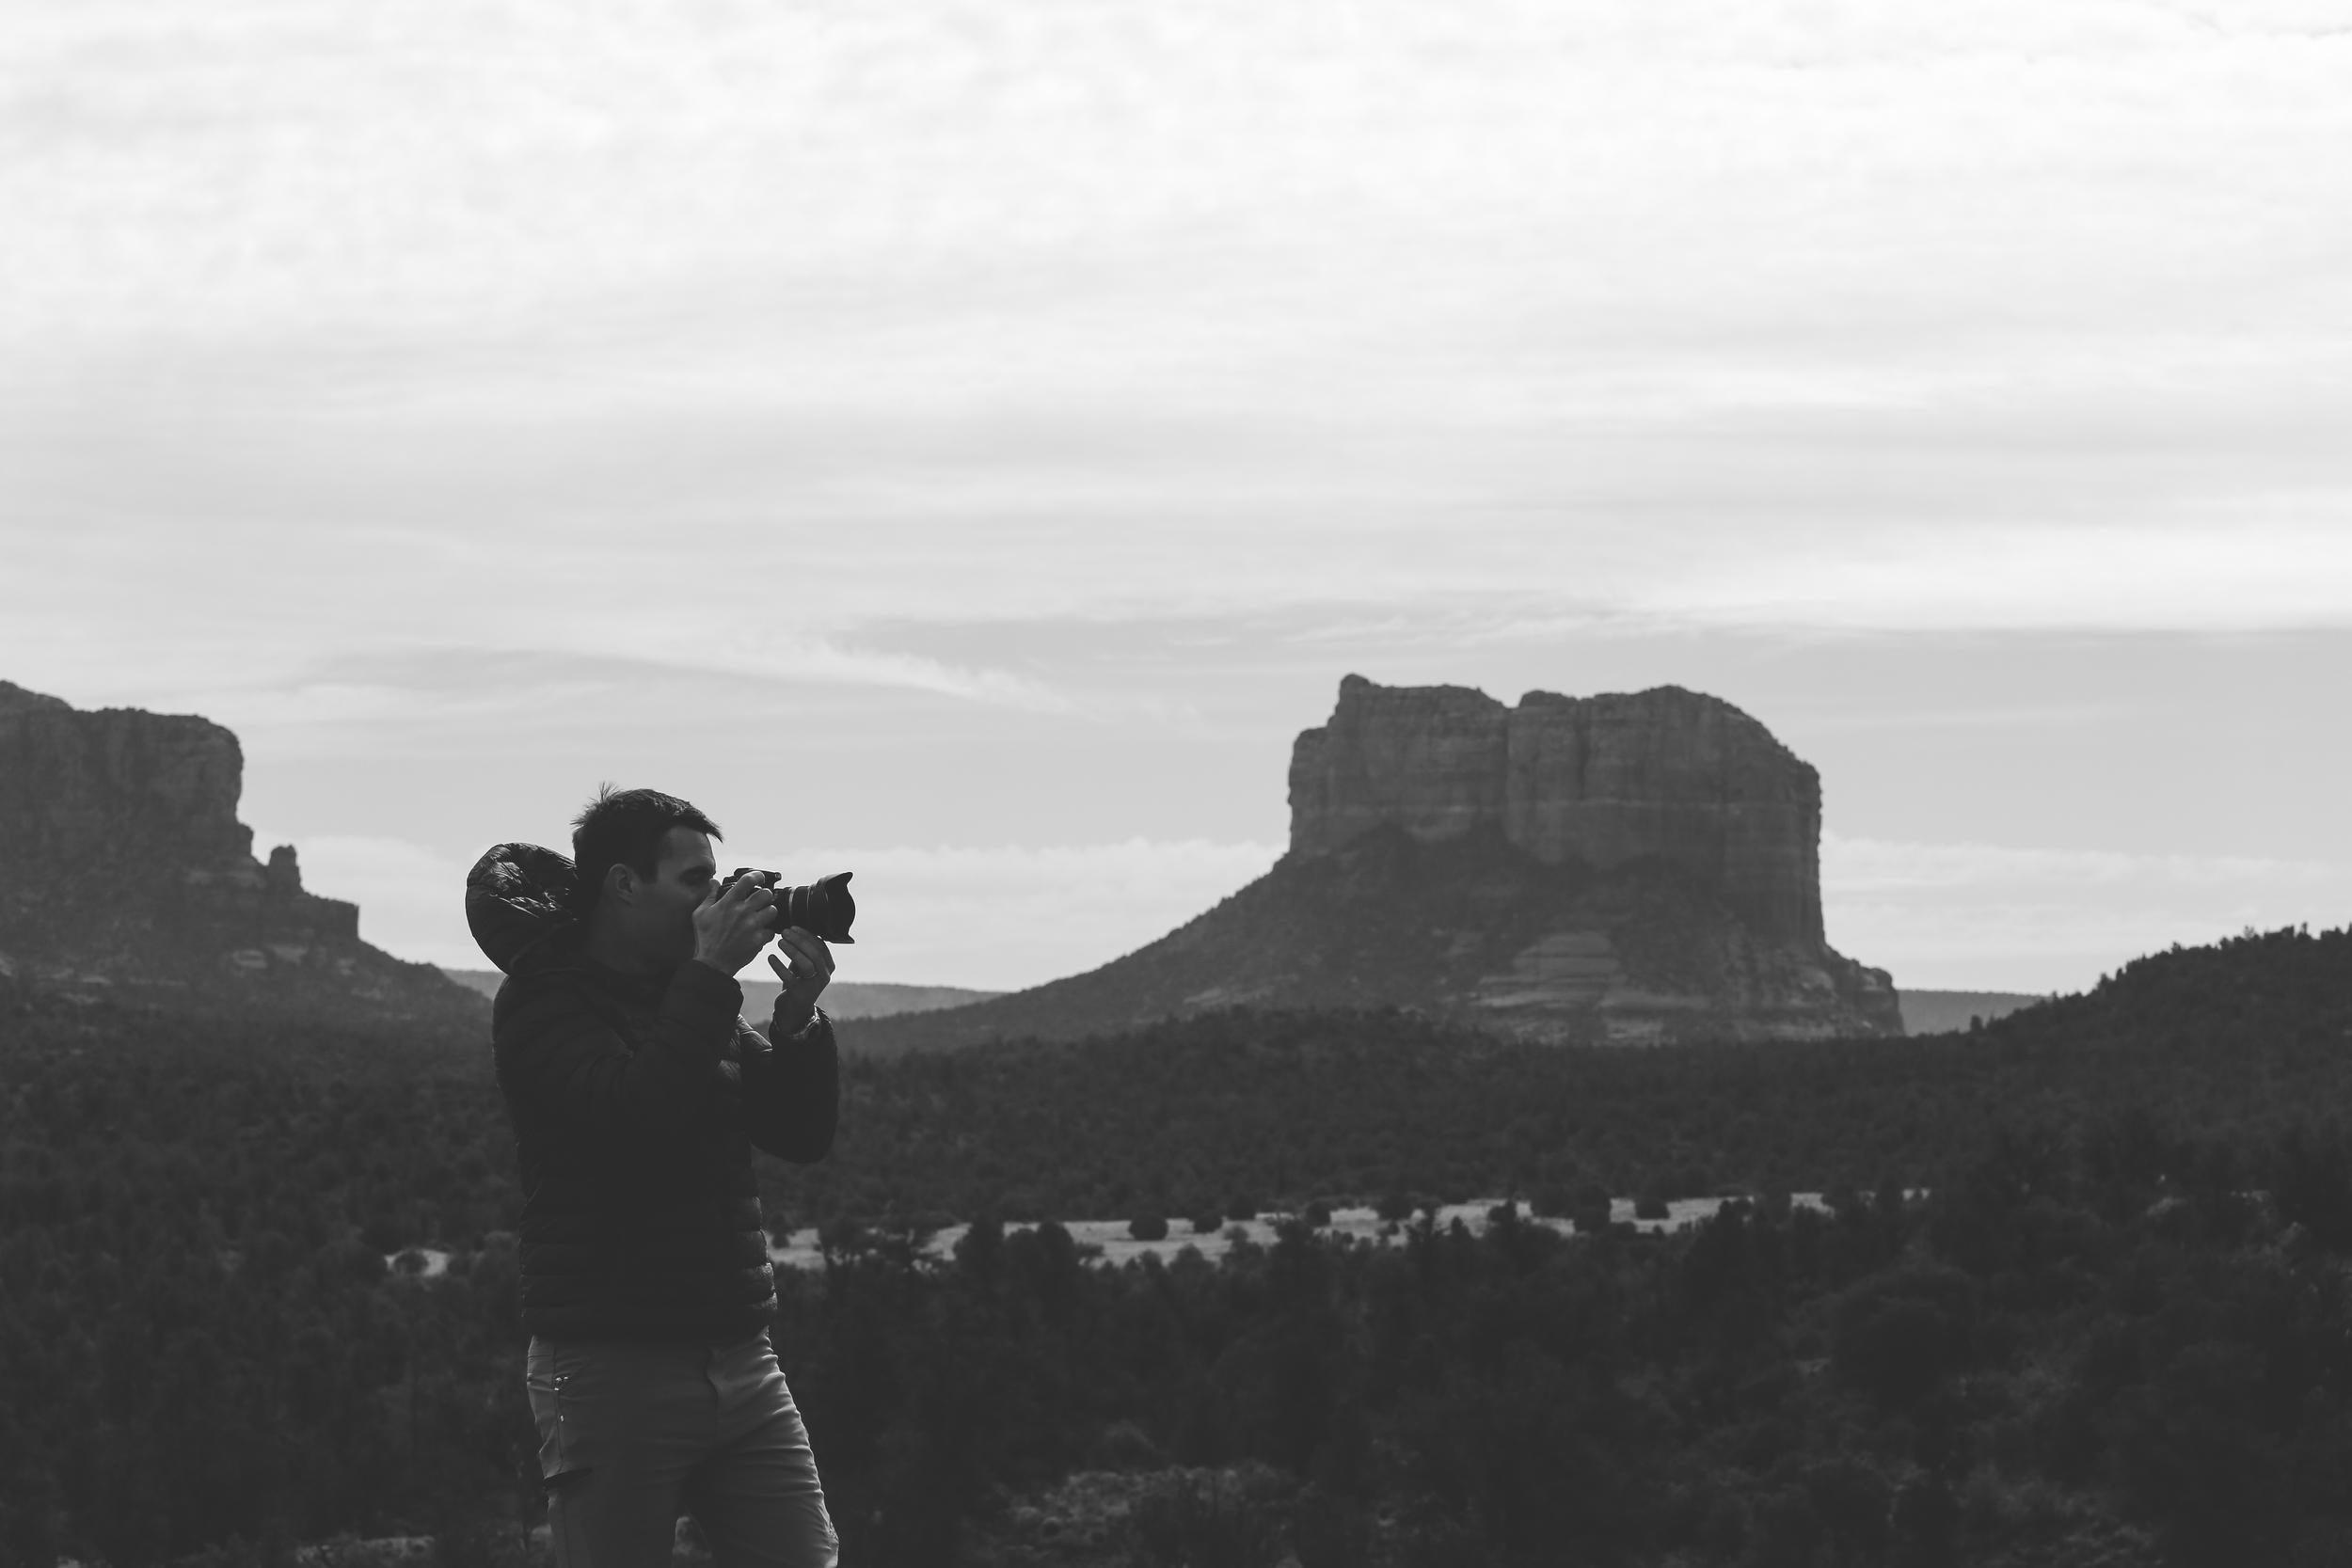 Honeymoon_Tuesday_Sedona_Arizona_JonCourvillePhotography-18.jpg